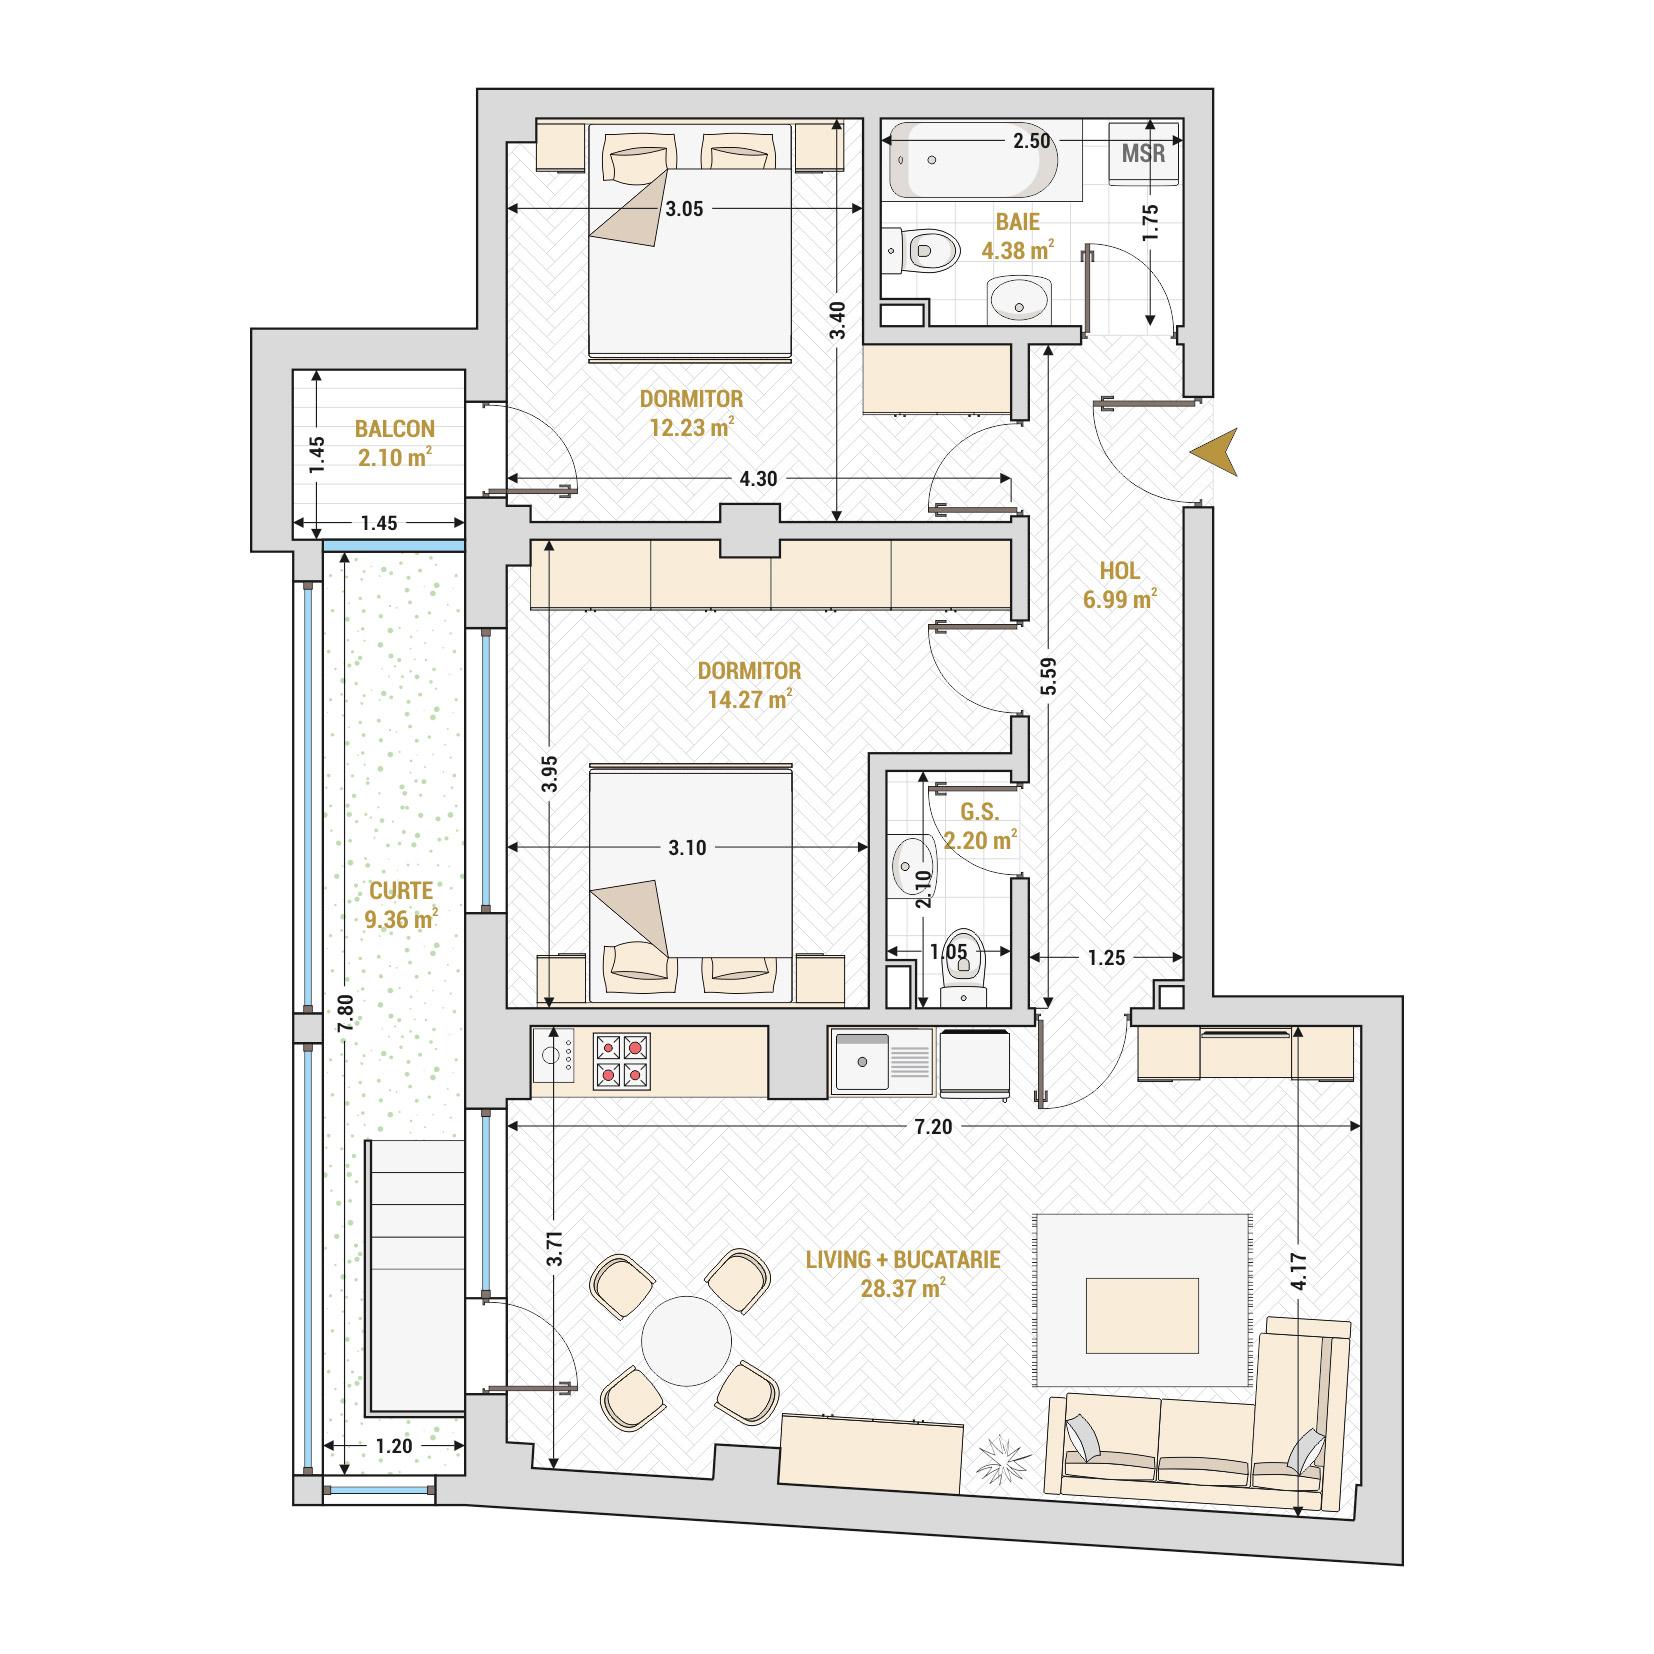 Apartament 3 camere de vanzare Bucuresti - Catedral Residence - Marriott, Piata Unirii, 13 Septembrie, Izvor - Tip 3 - T2A